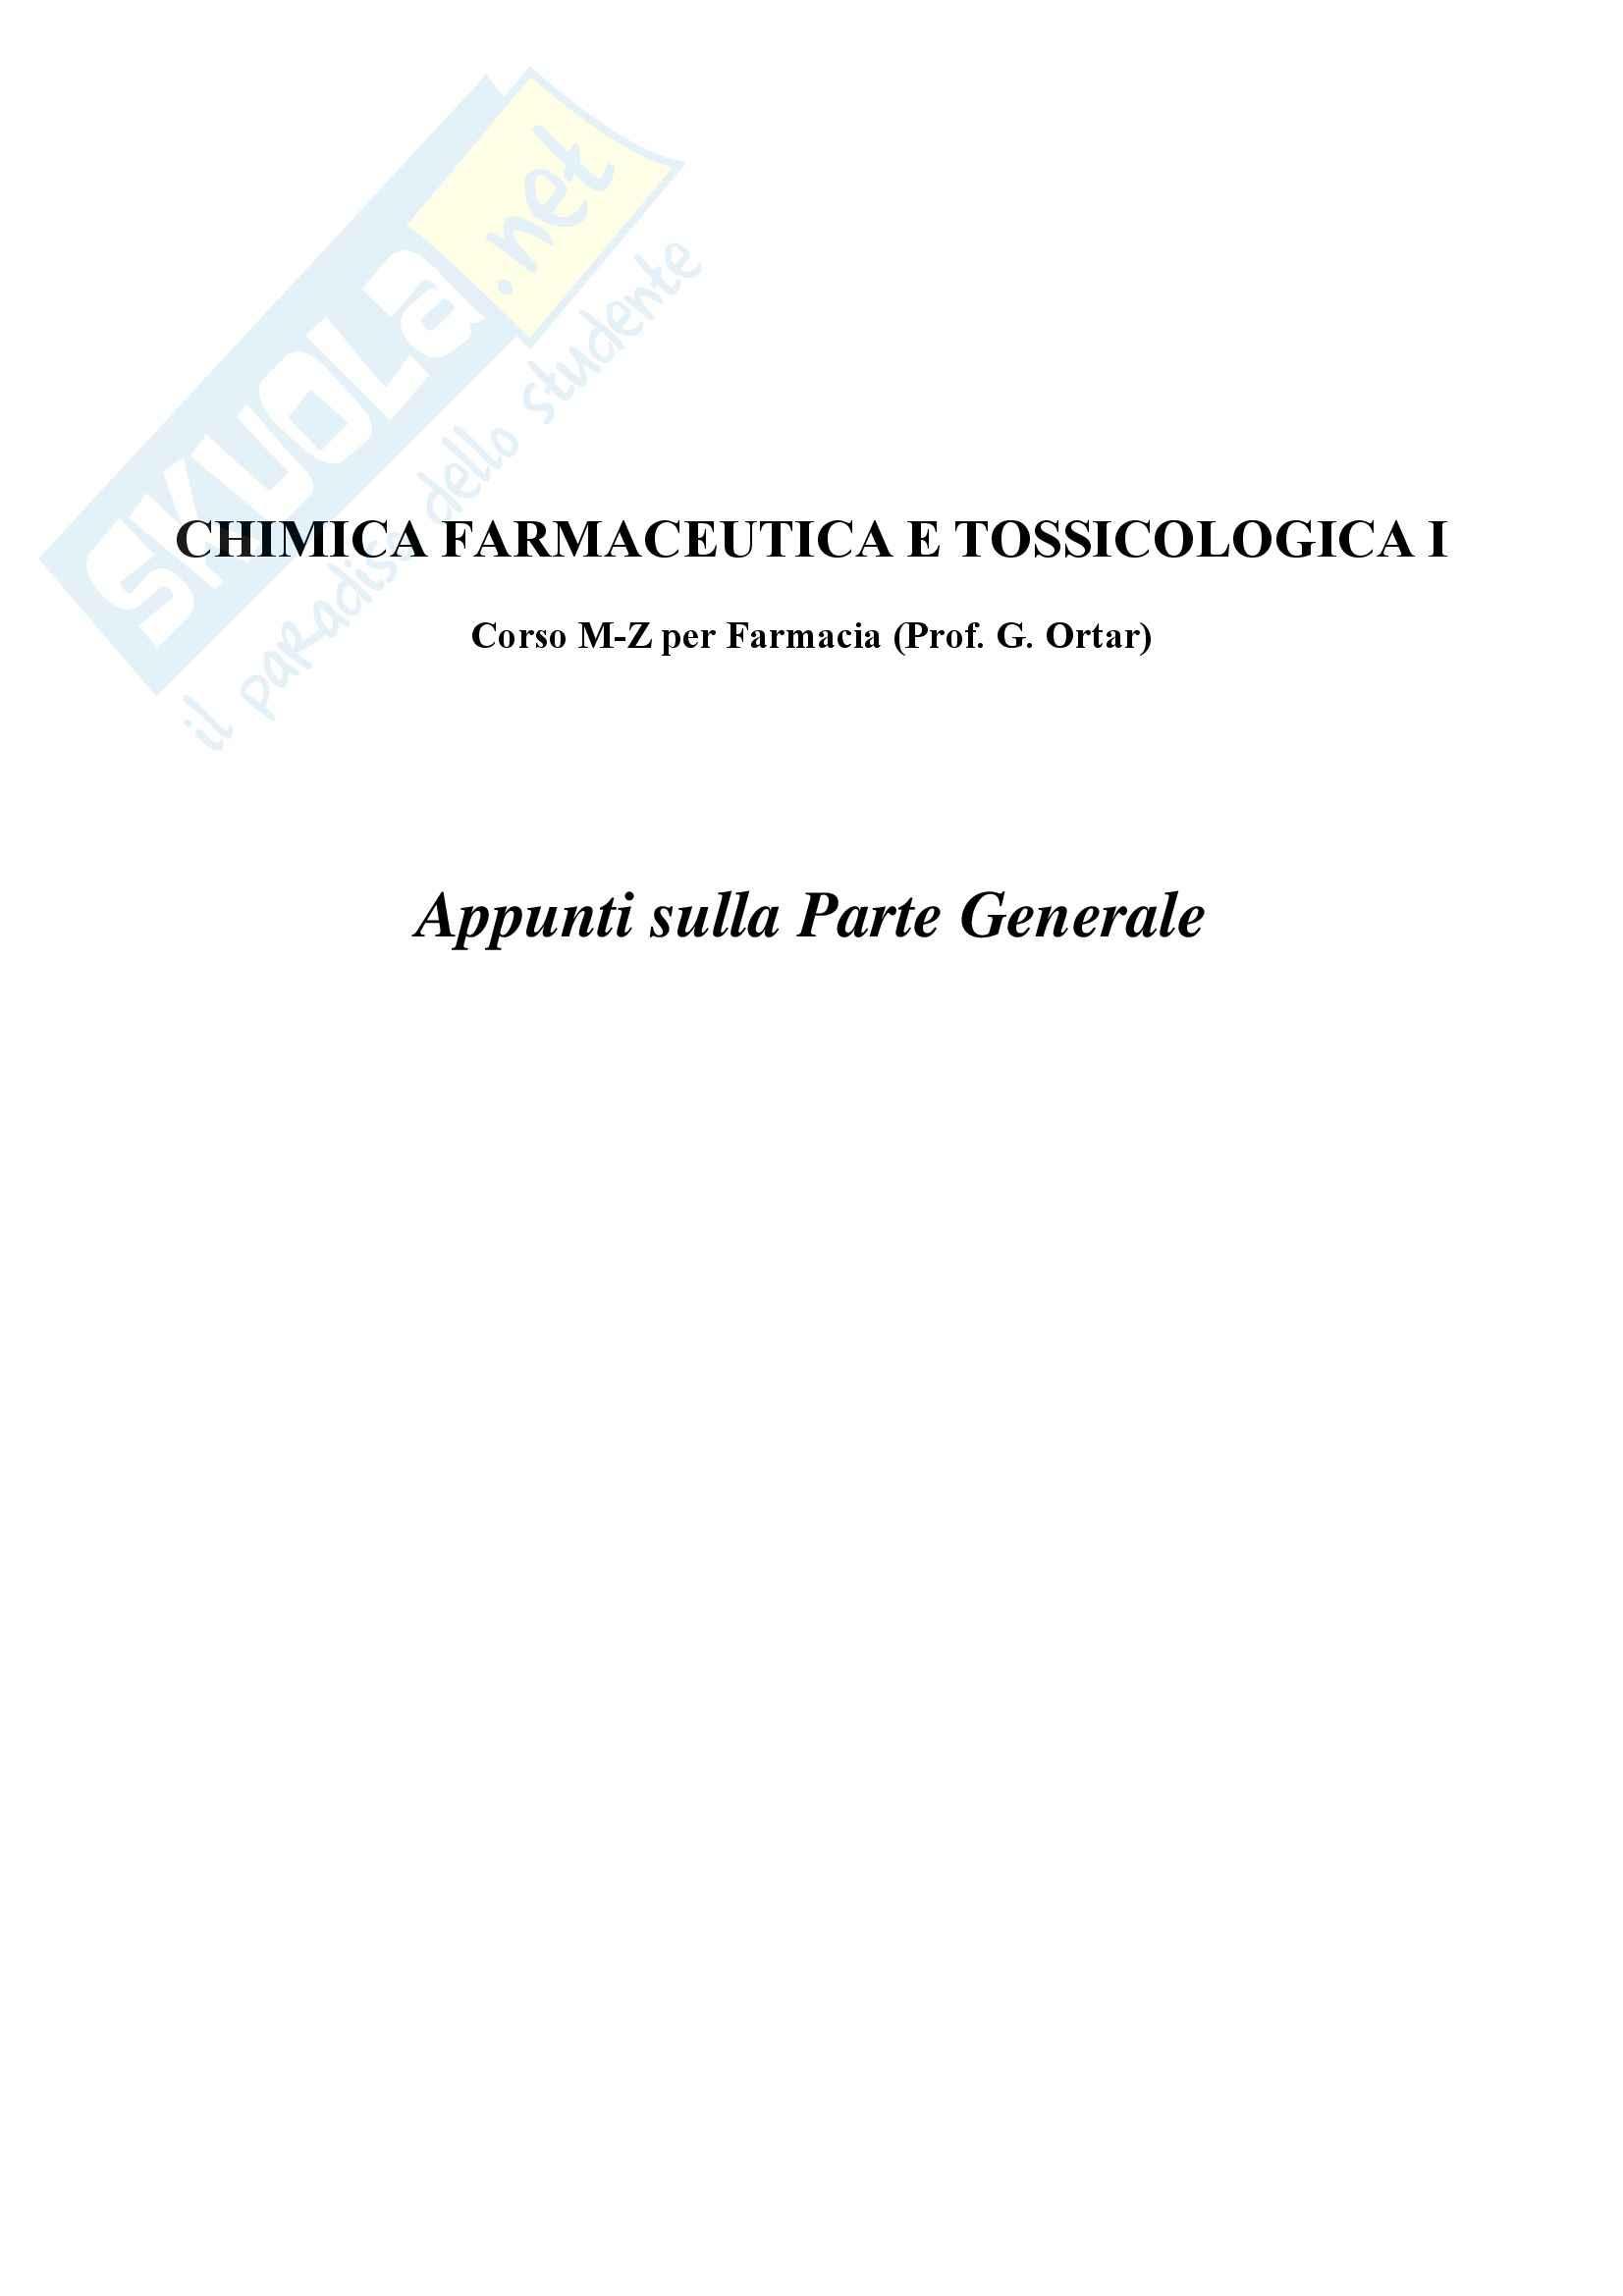 Chimica farmaceutica 1 - parte generale